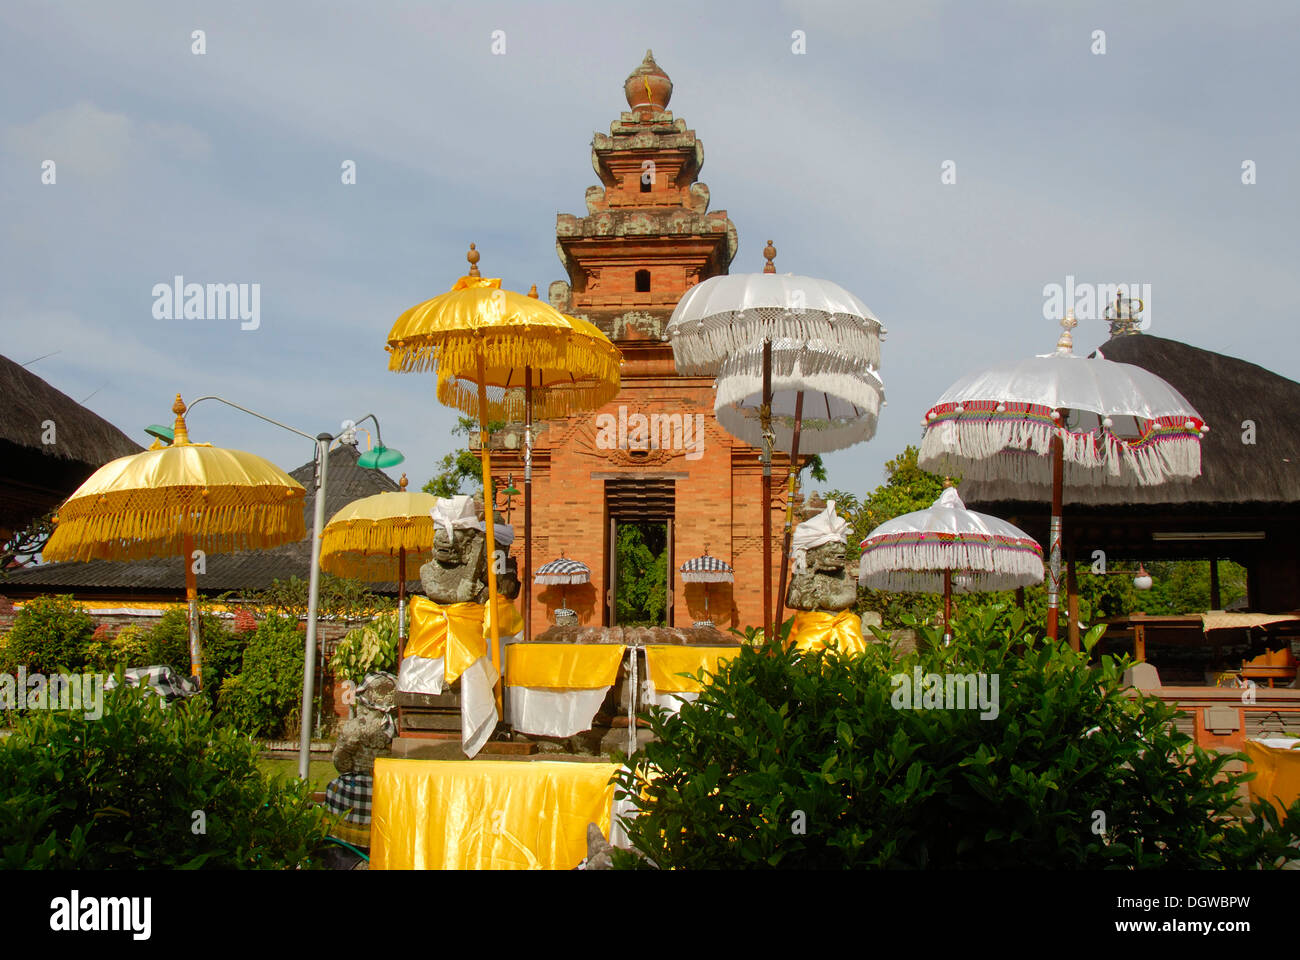 Bali Hinduism, Temple Tower, yellow and white umbrellas, Pura Sadha Temple, Kapal, Bali, Indonesia, Southeast Asia, Asia - Stock Image